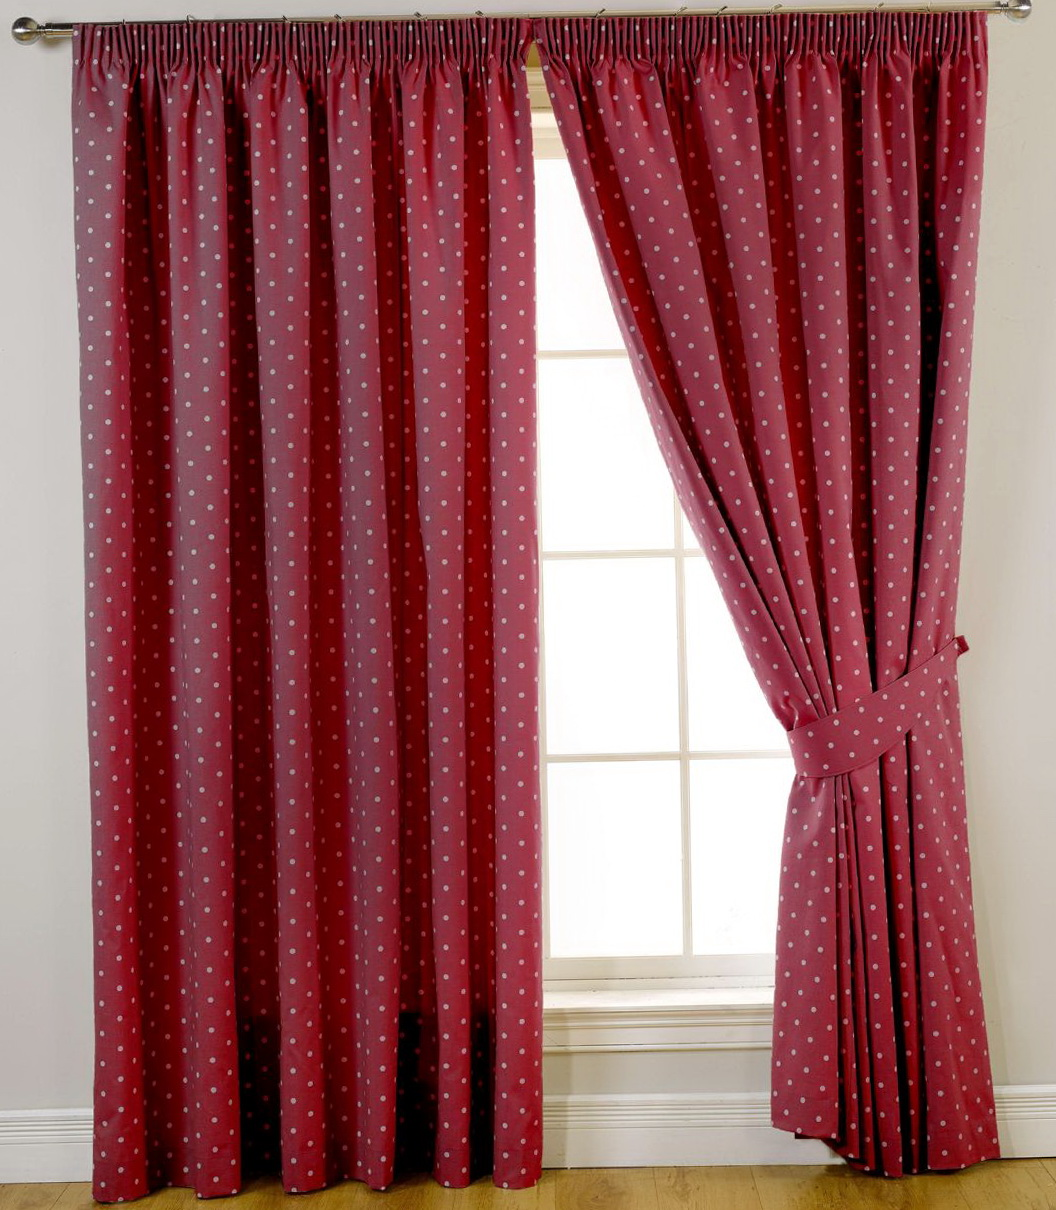 Blackout Curtains Uk